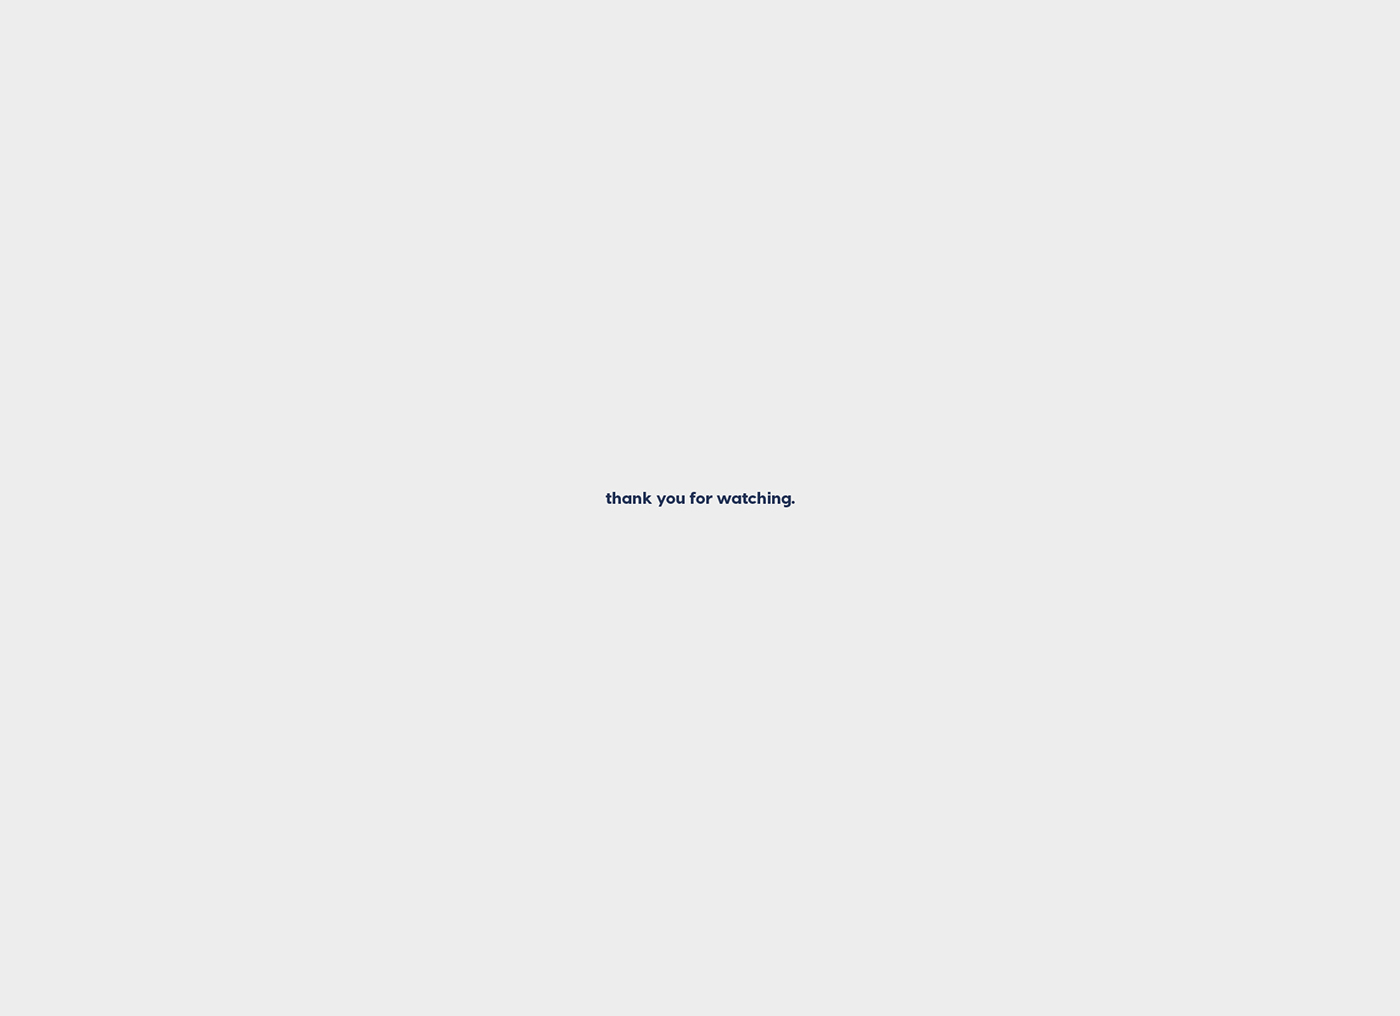 identity brandind cinema4d Render cards logo visual